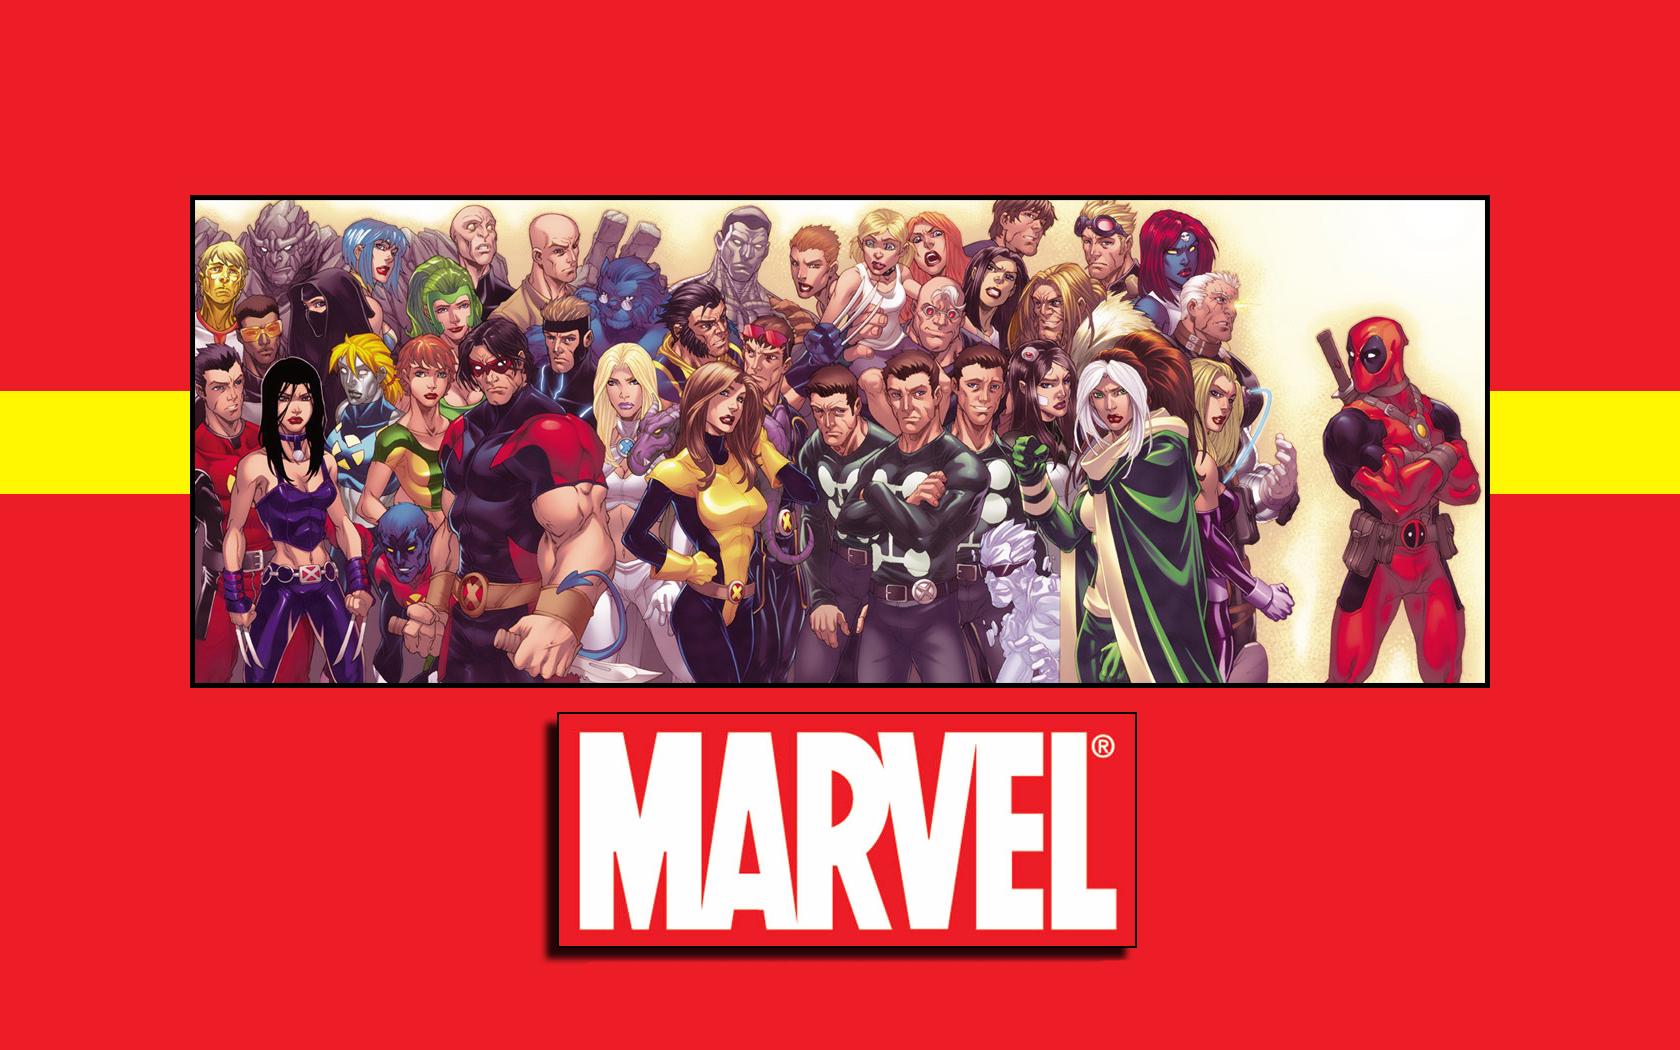 Download X Men Wolverine Wallpaper 1680x1050 Wallpoper 412097 1680x1050